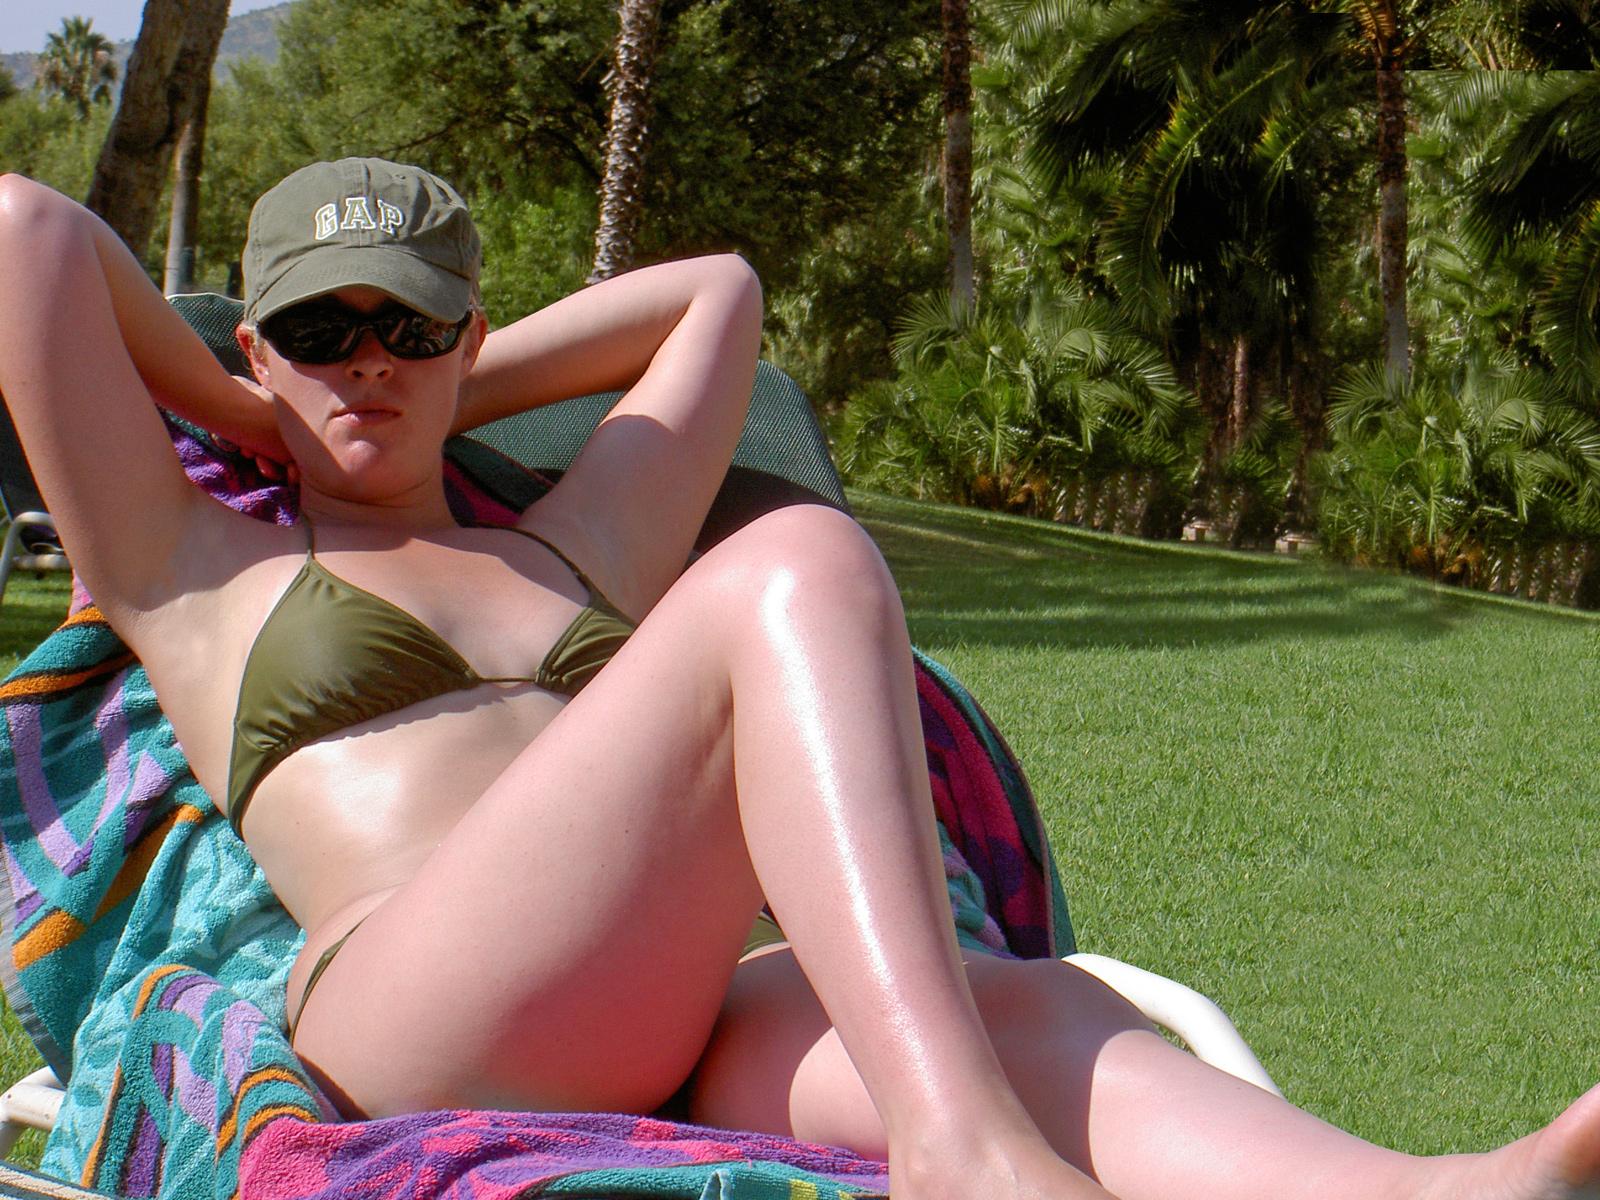 The Golden Rules of Sunbathing